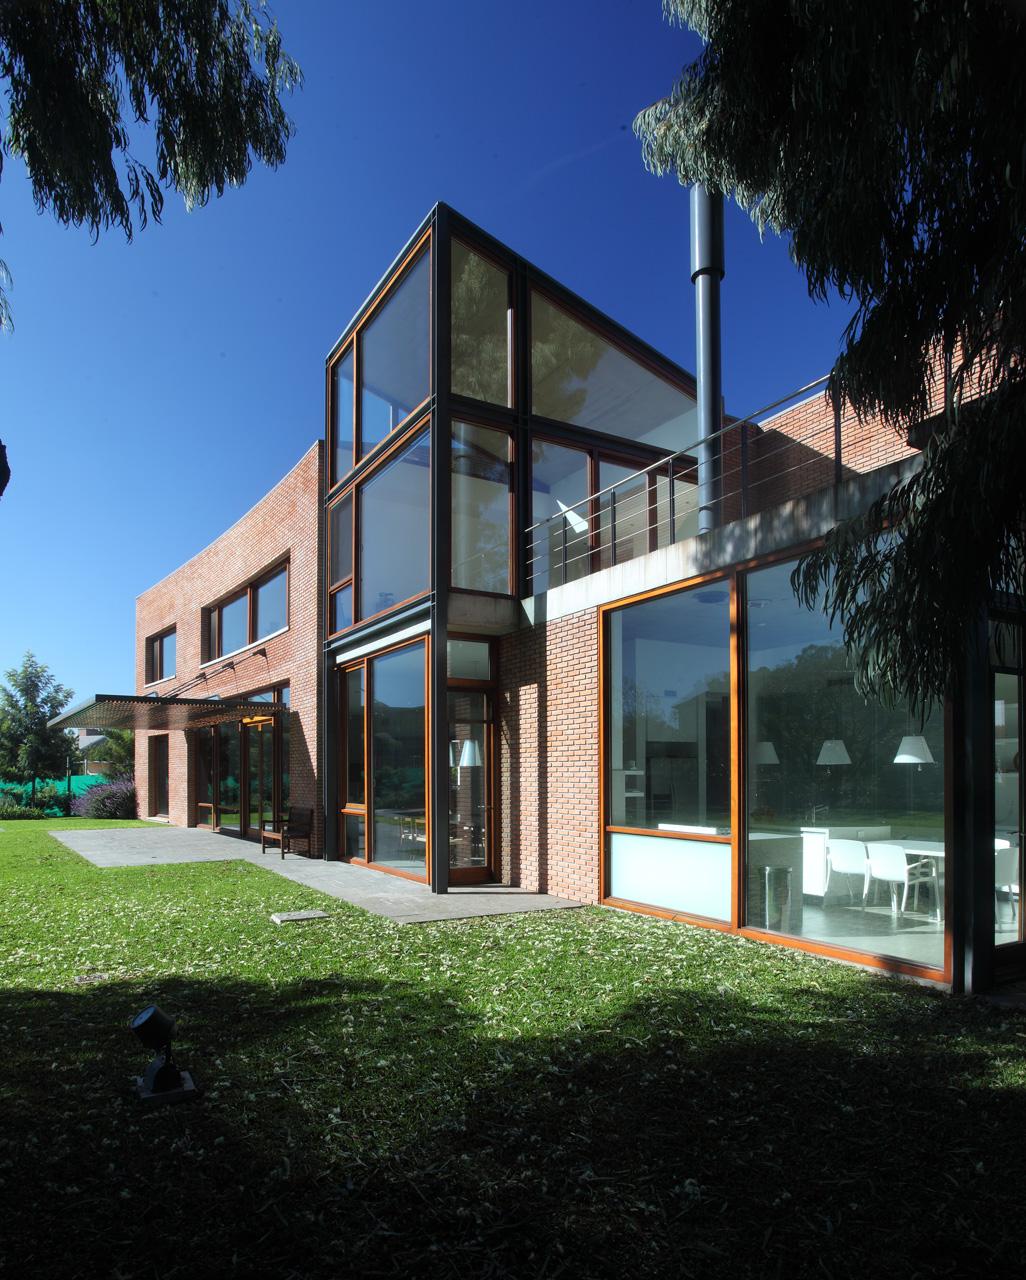 Casa em San Jorge / David Mutal Arquitectos, © Gustavo Sosa Pinilla